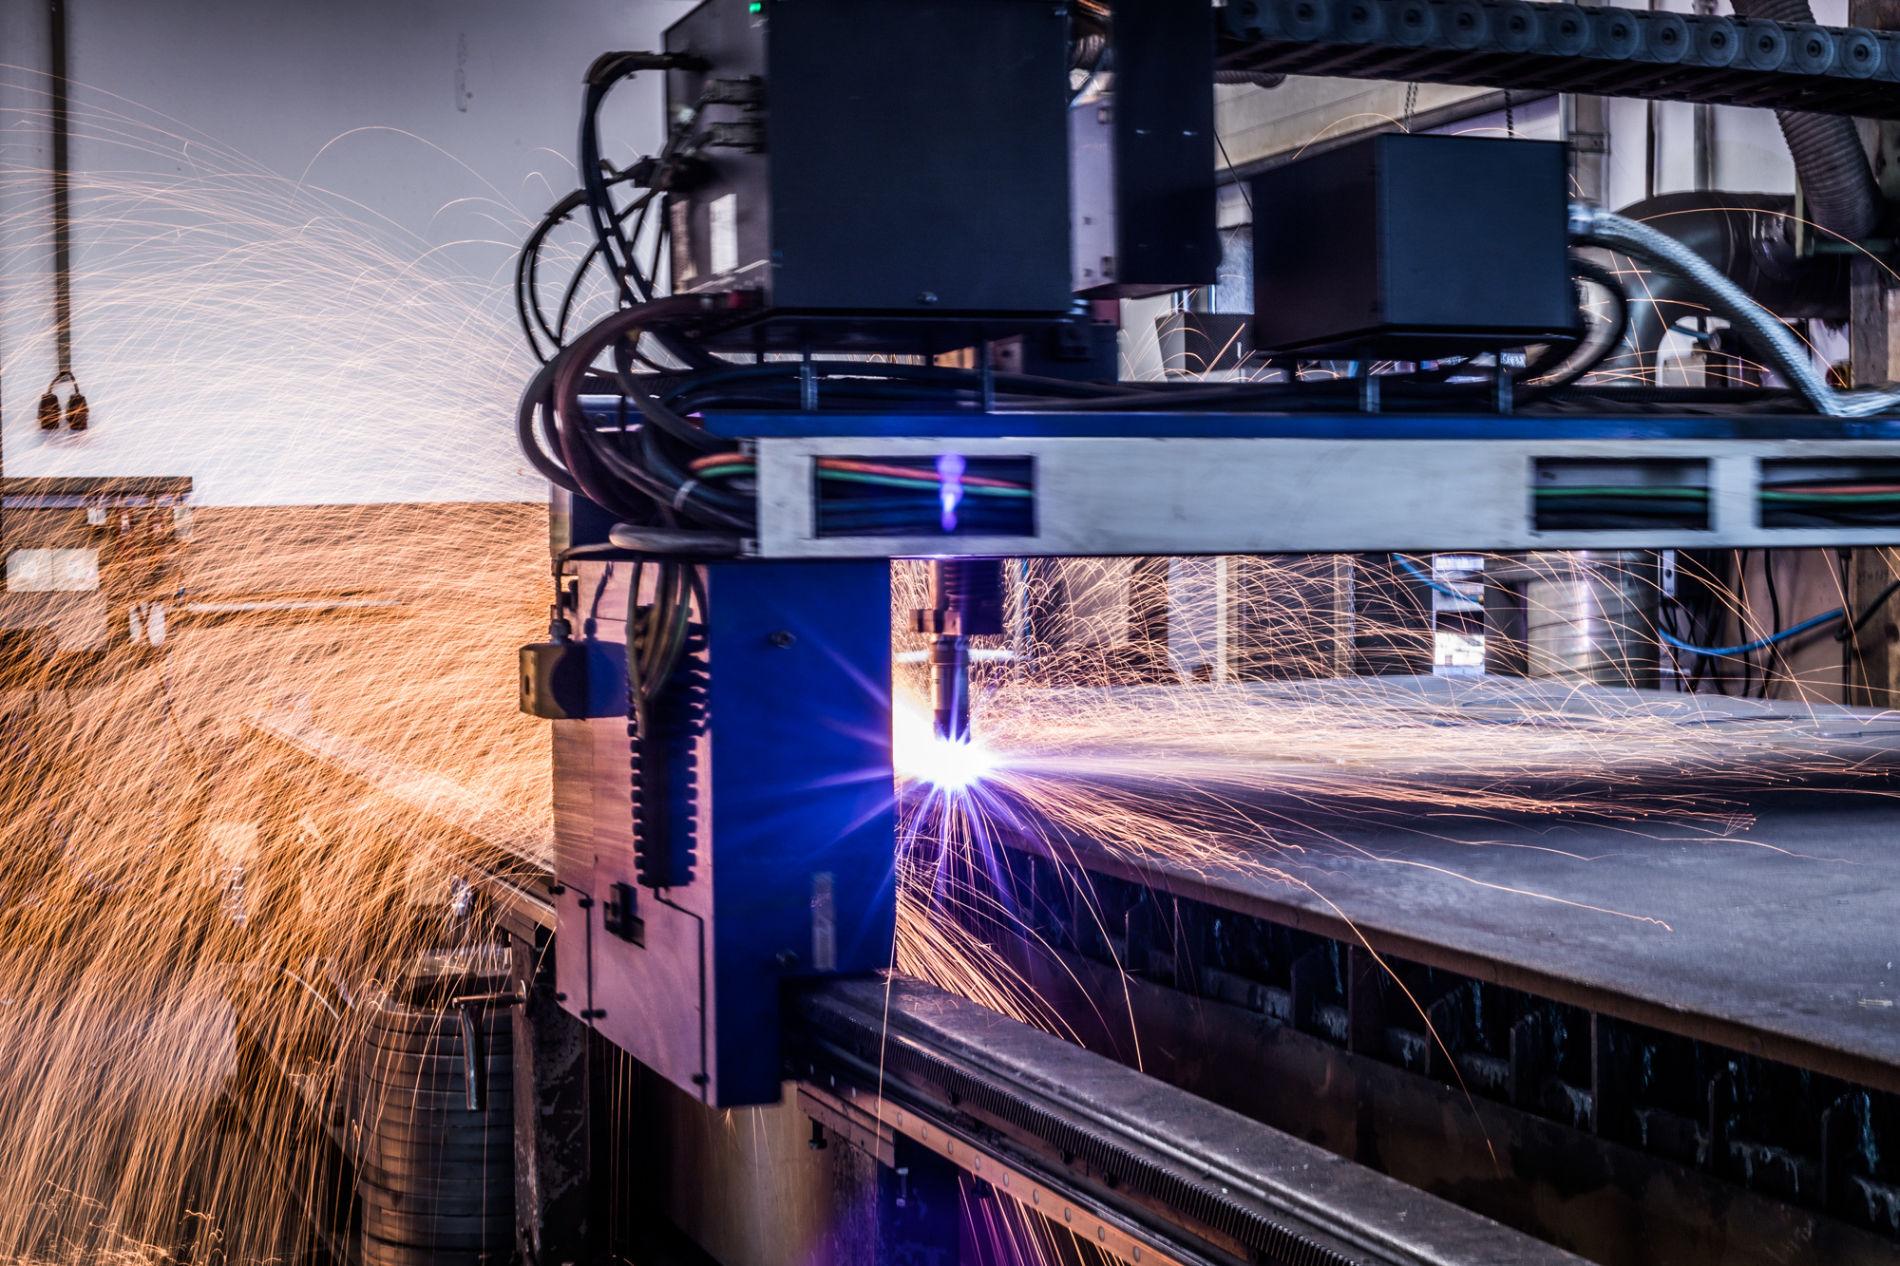 CNC Plasmaschneiden Maschinenbau Frick